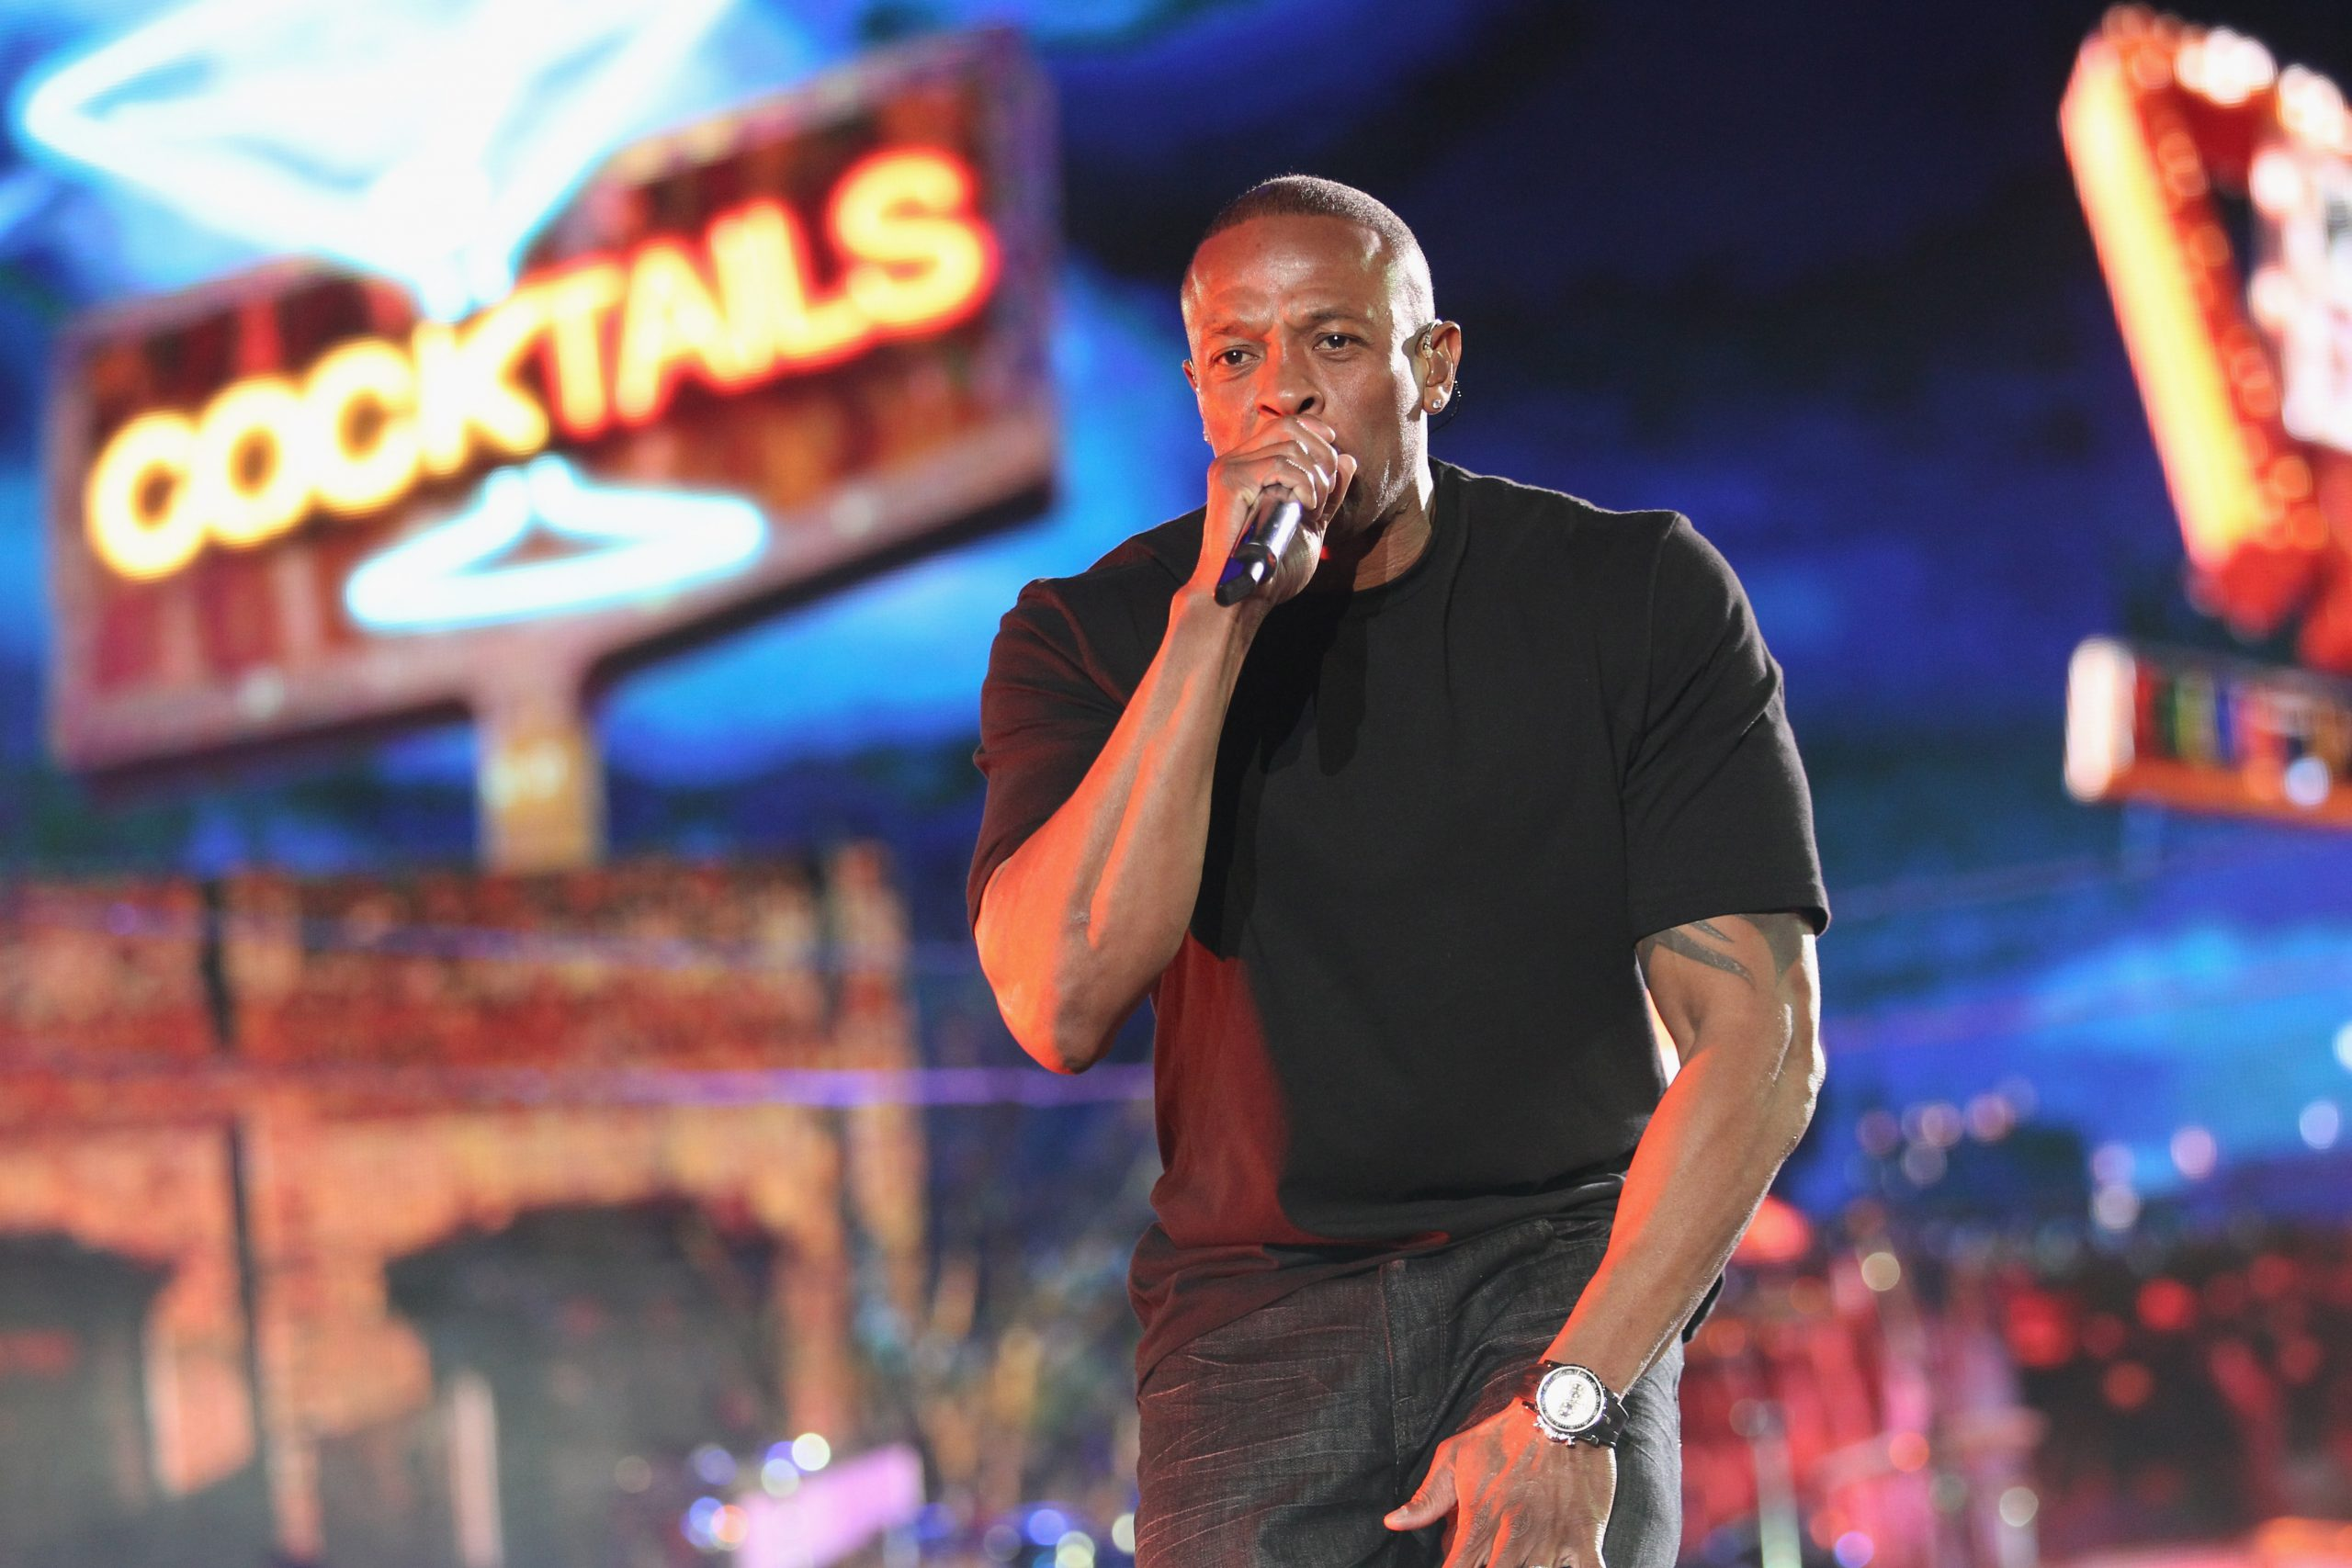 Hospitalizan al legendario Dr. Dre luego de sufrir un aneurisma cerebral